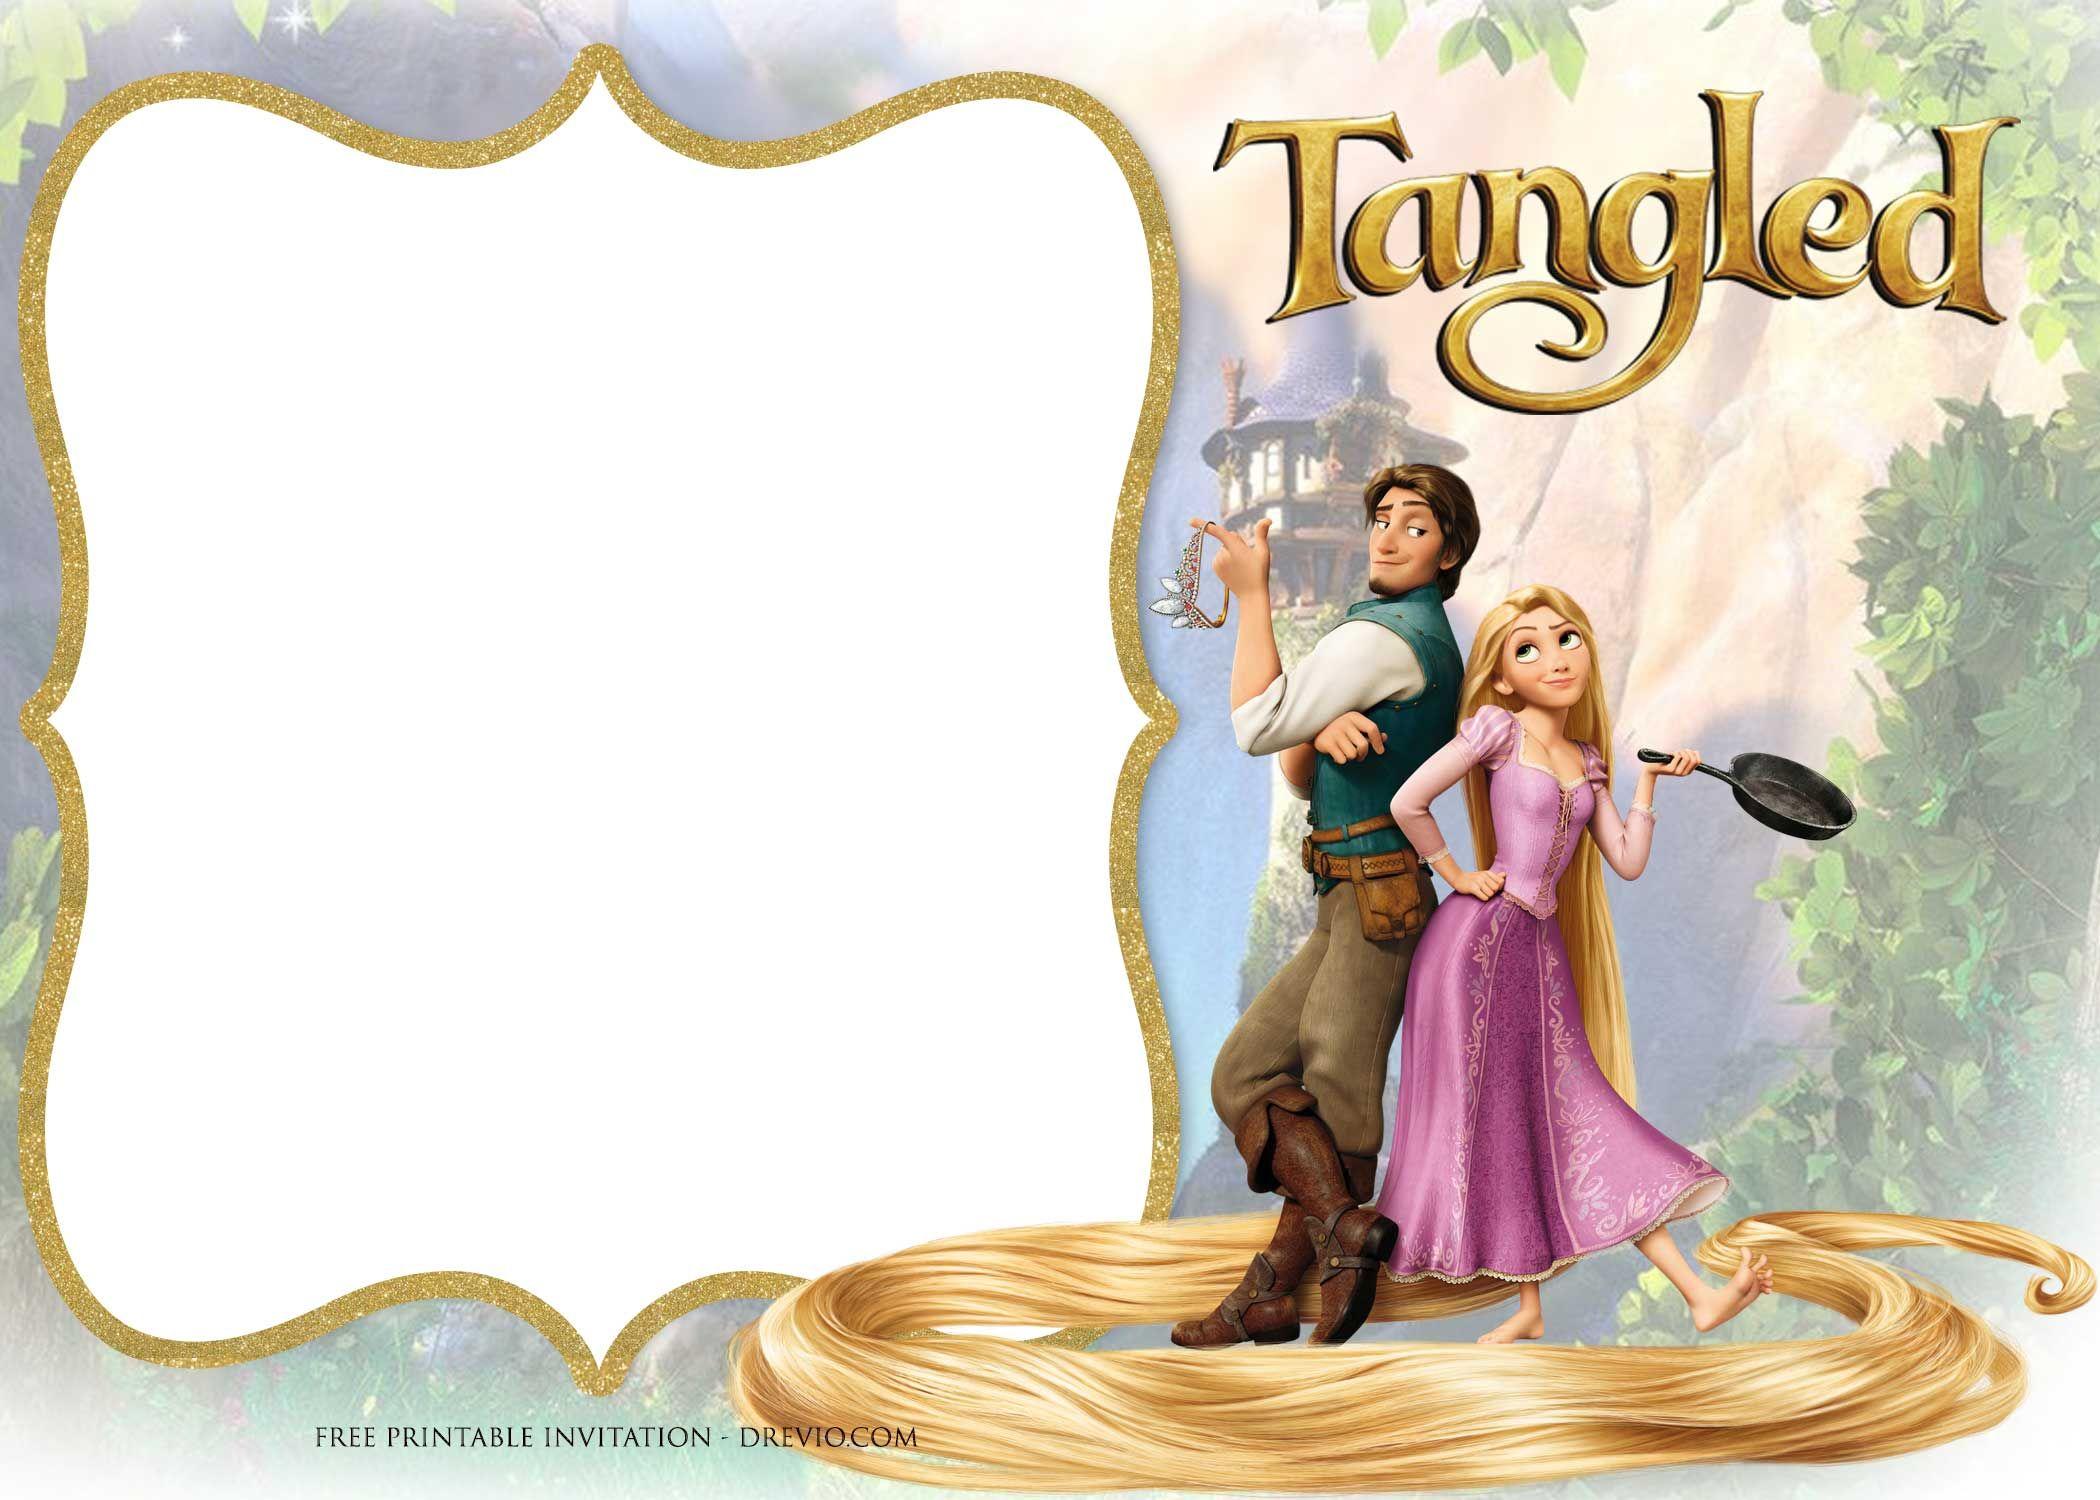 Free Printable Princess Rapunzel Invitation Templates Rapunzel Birthday Invitation Rapunzel Invitations Tangled Invitations